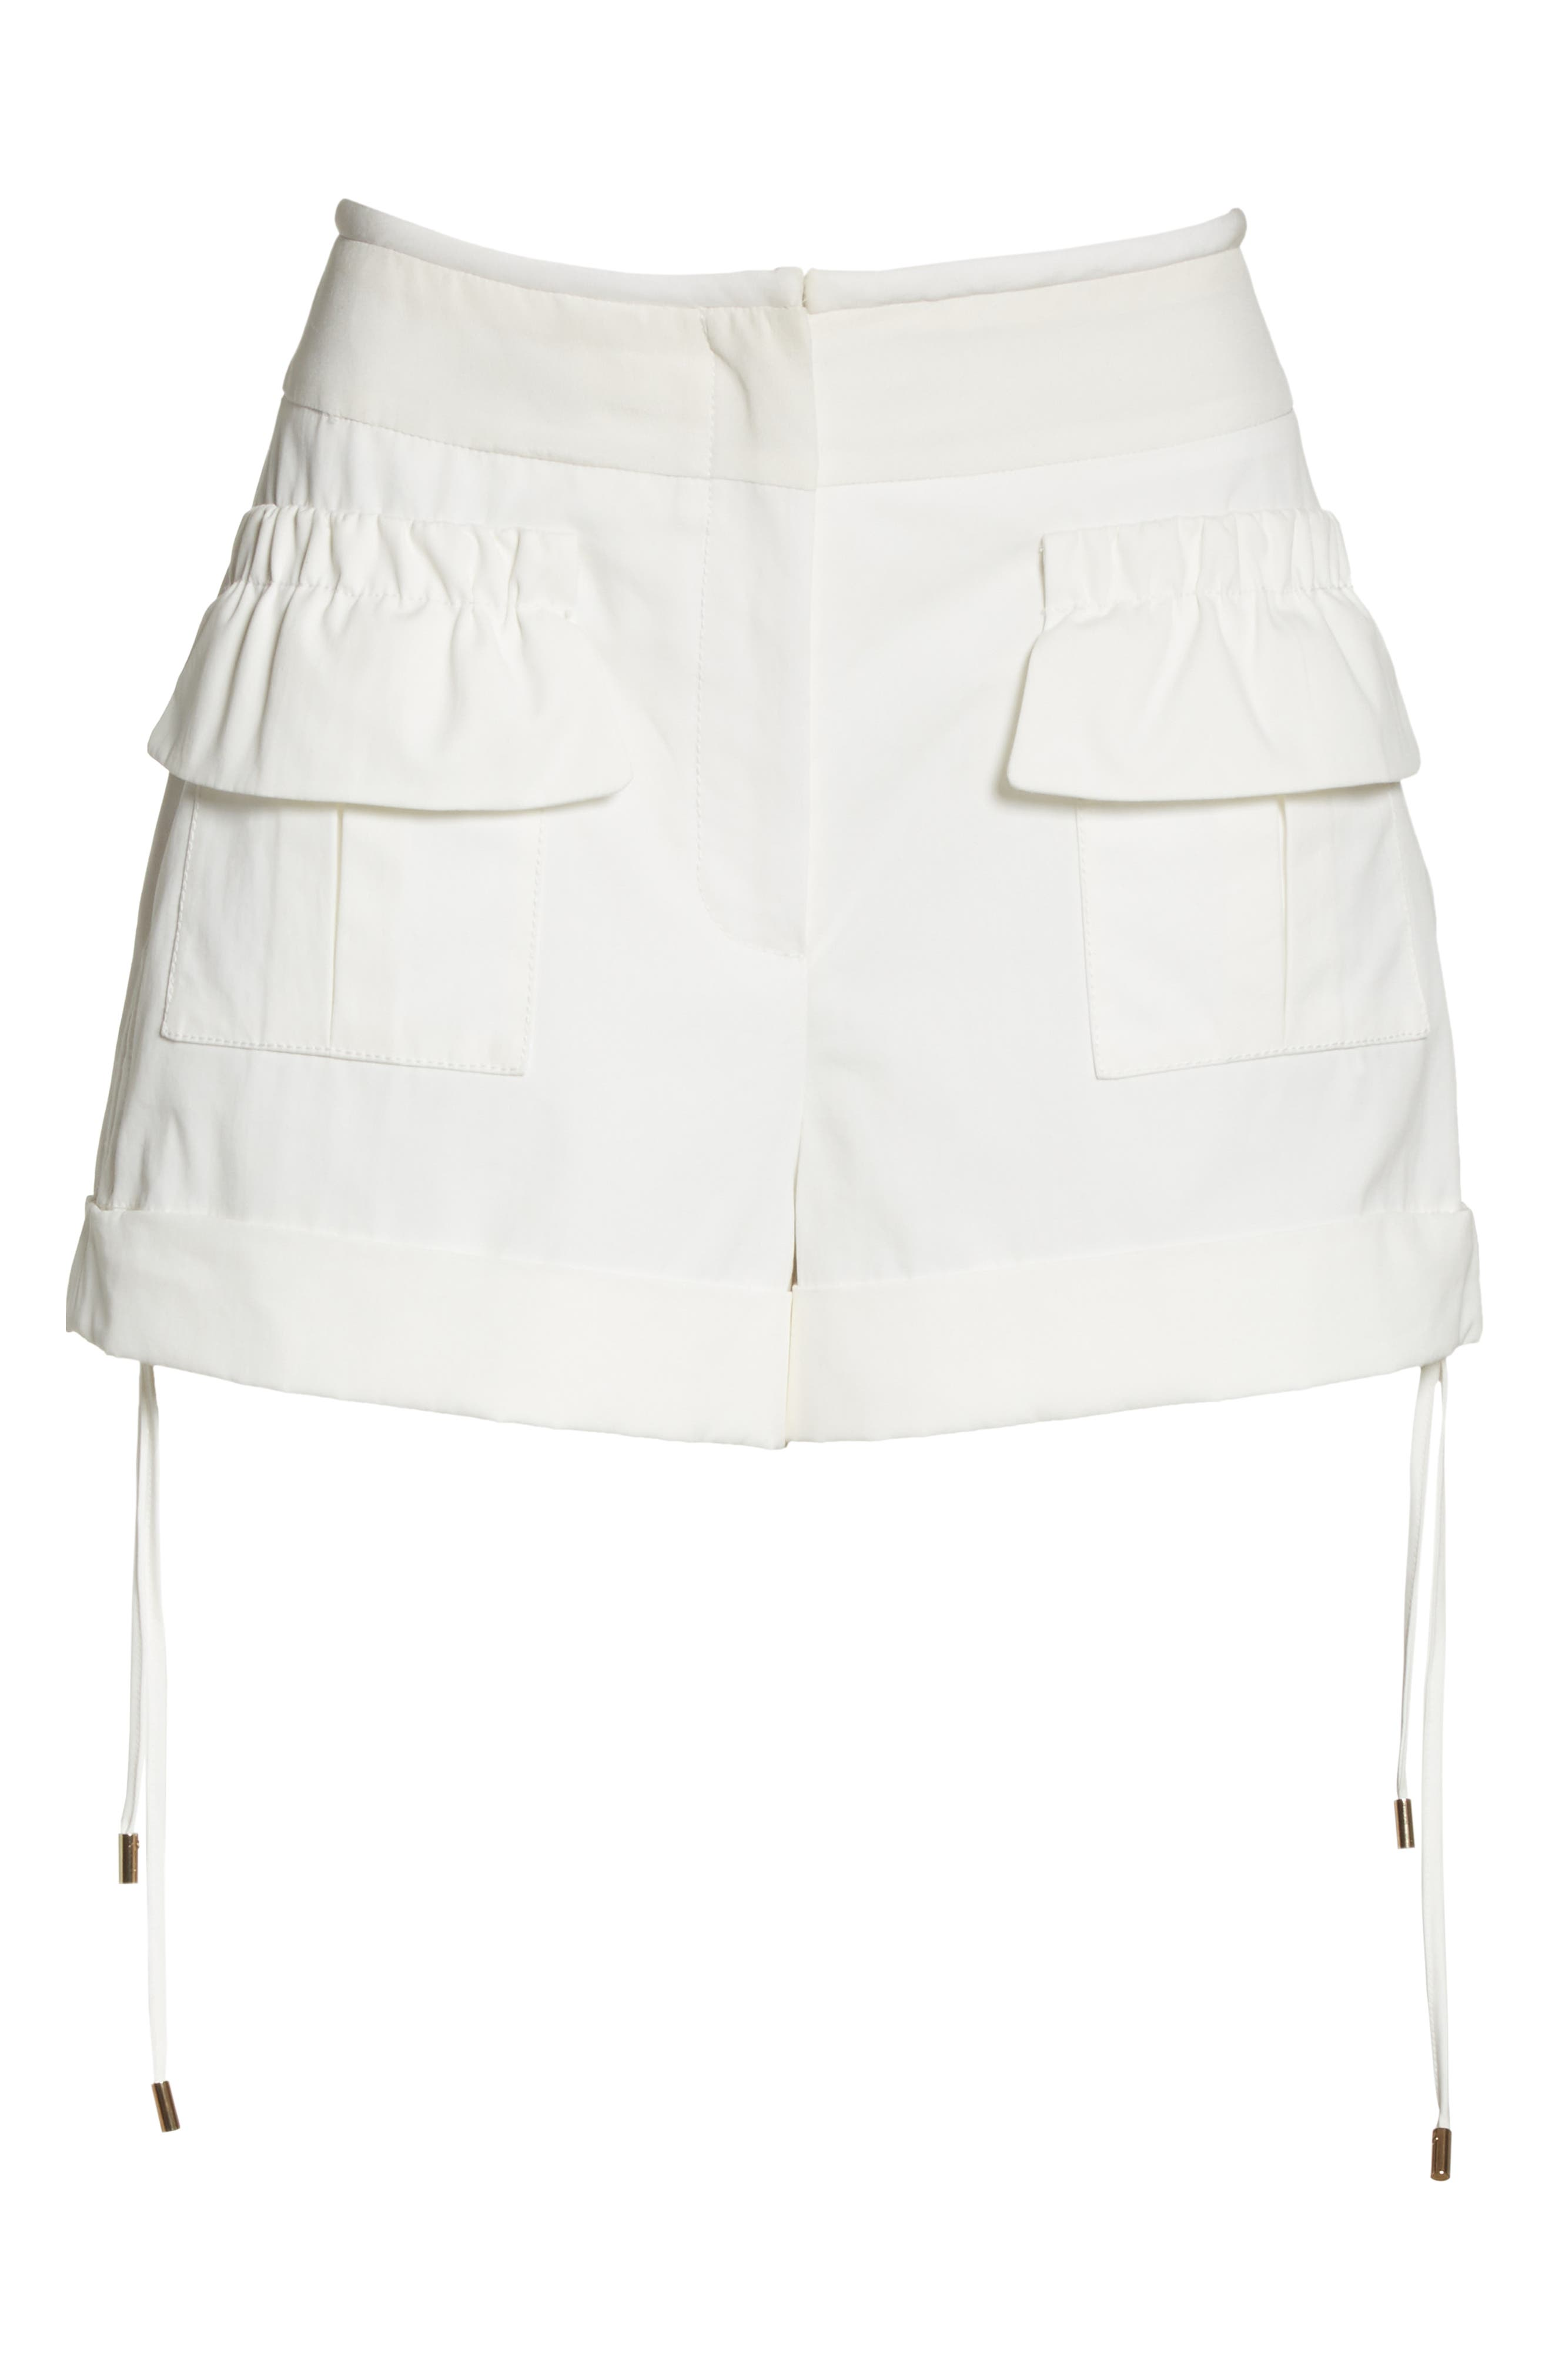 High Waist Shorts,                             Alternate thumbnail 6, color,                             Blanc Antique